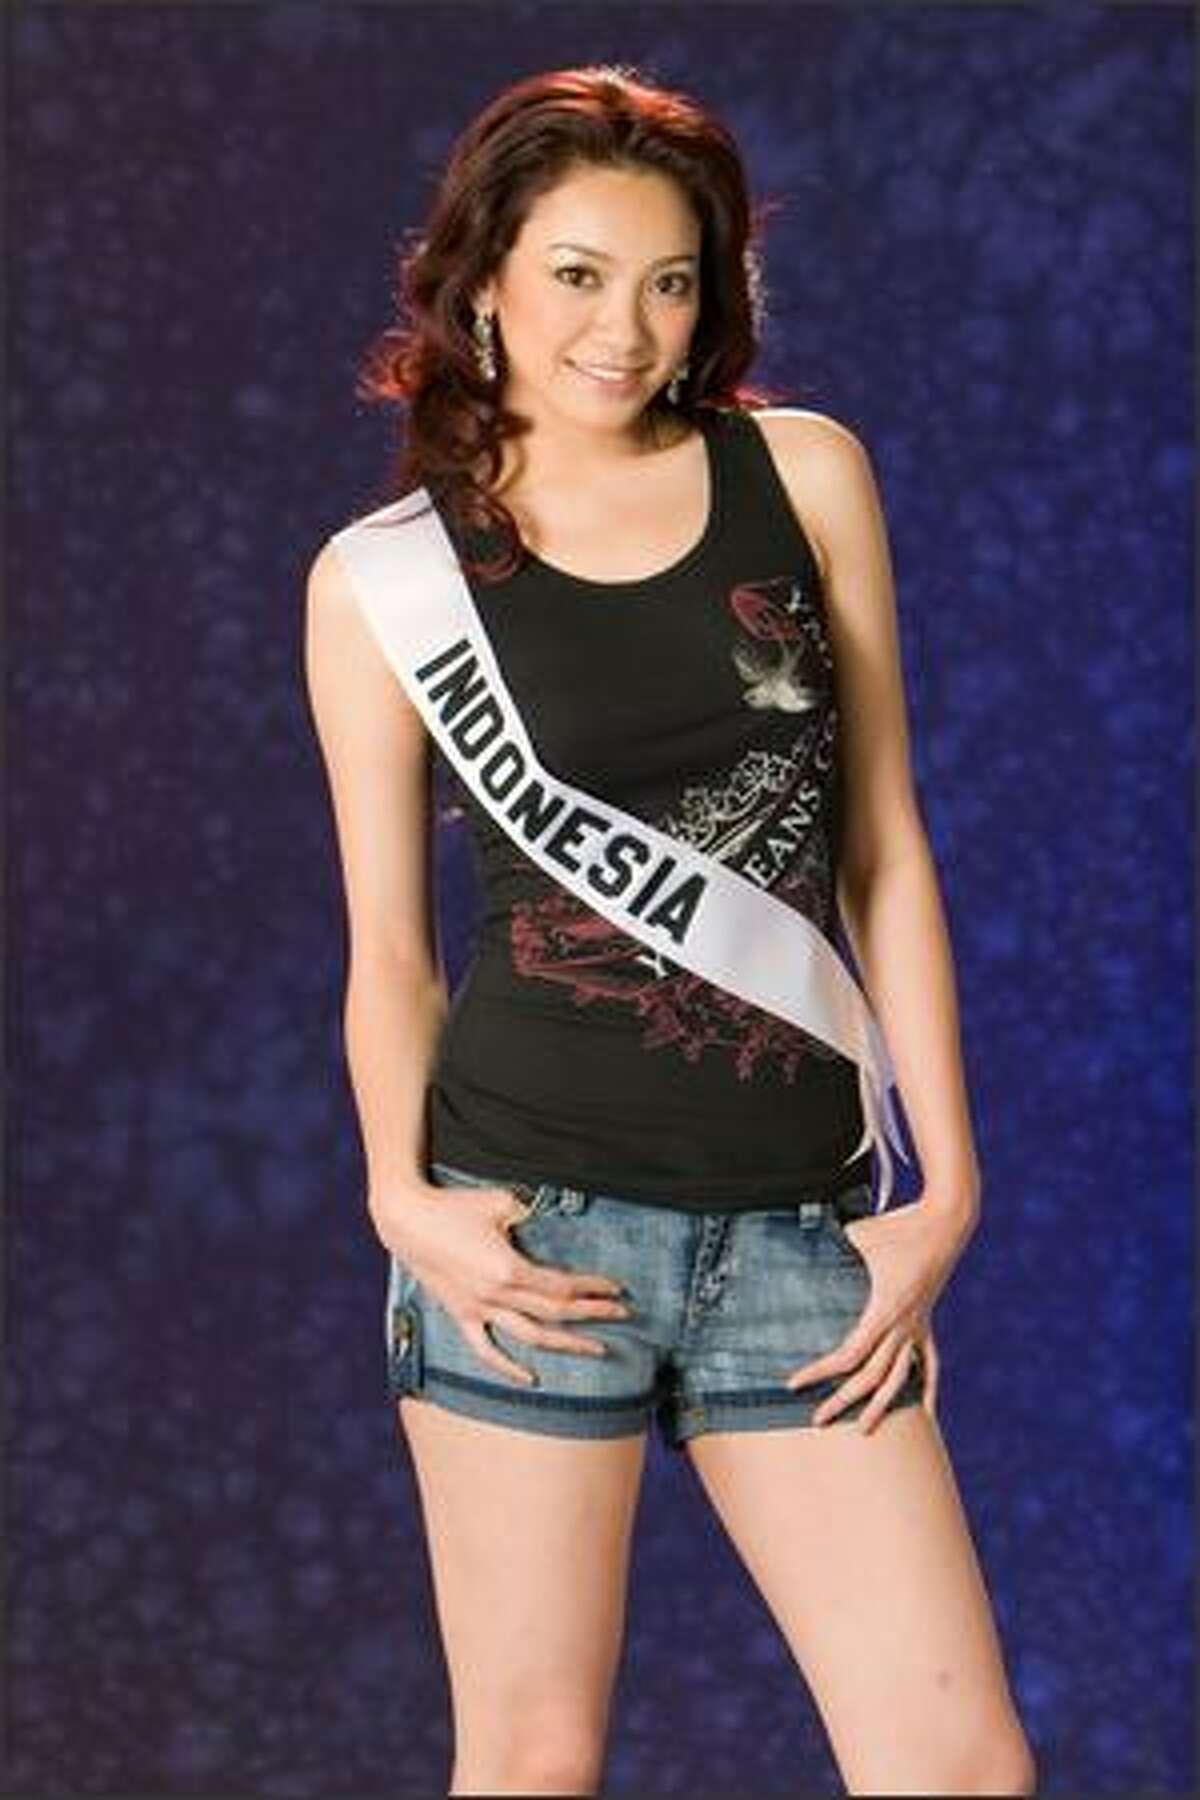 Agni Kuswardono, Miss Indonesia 2007.